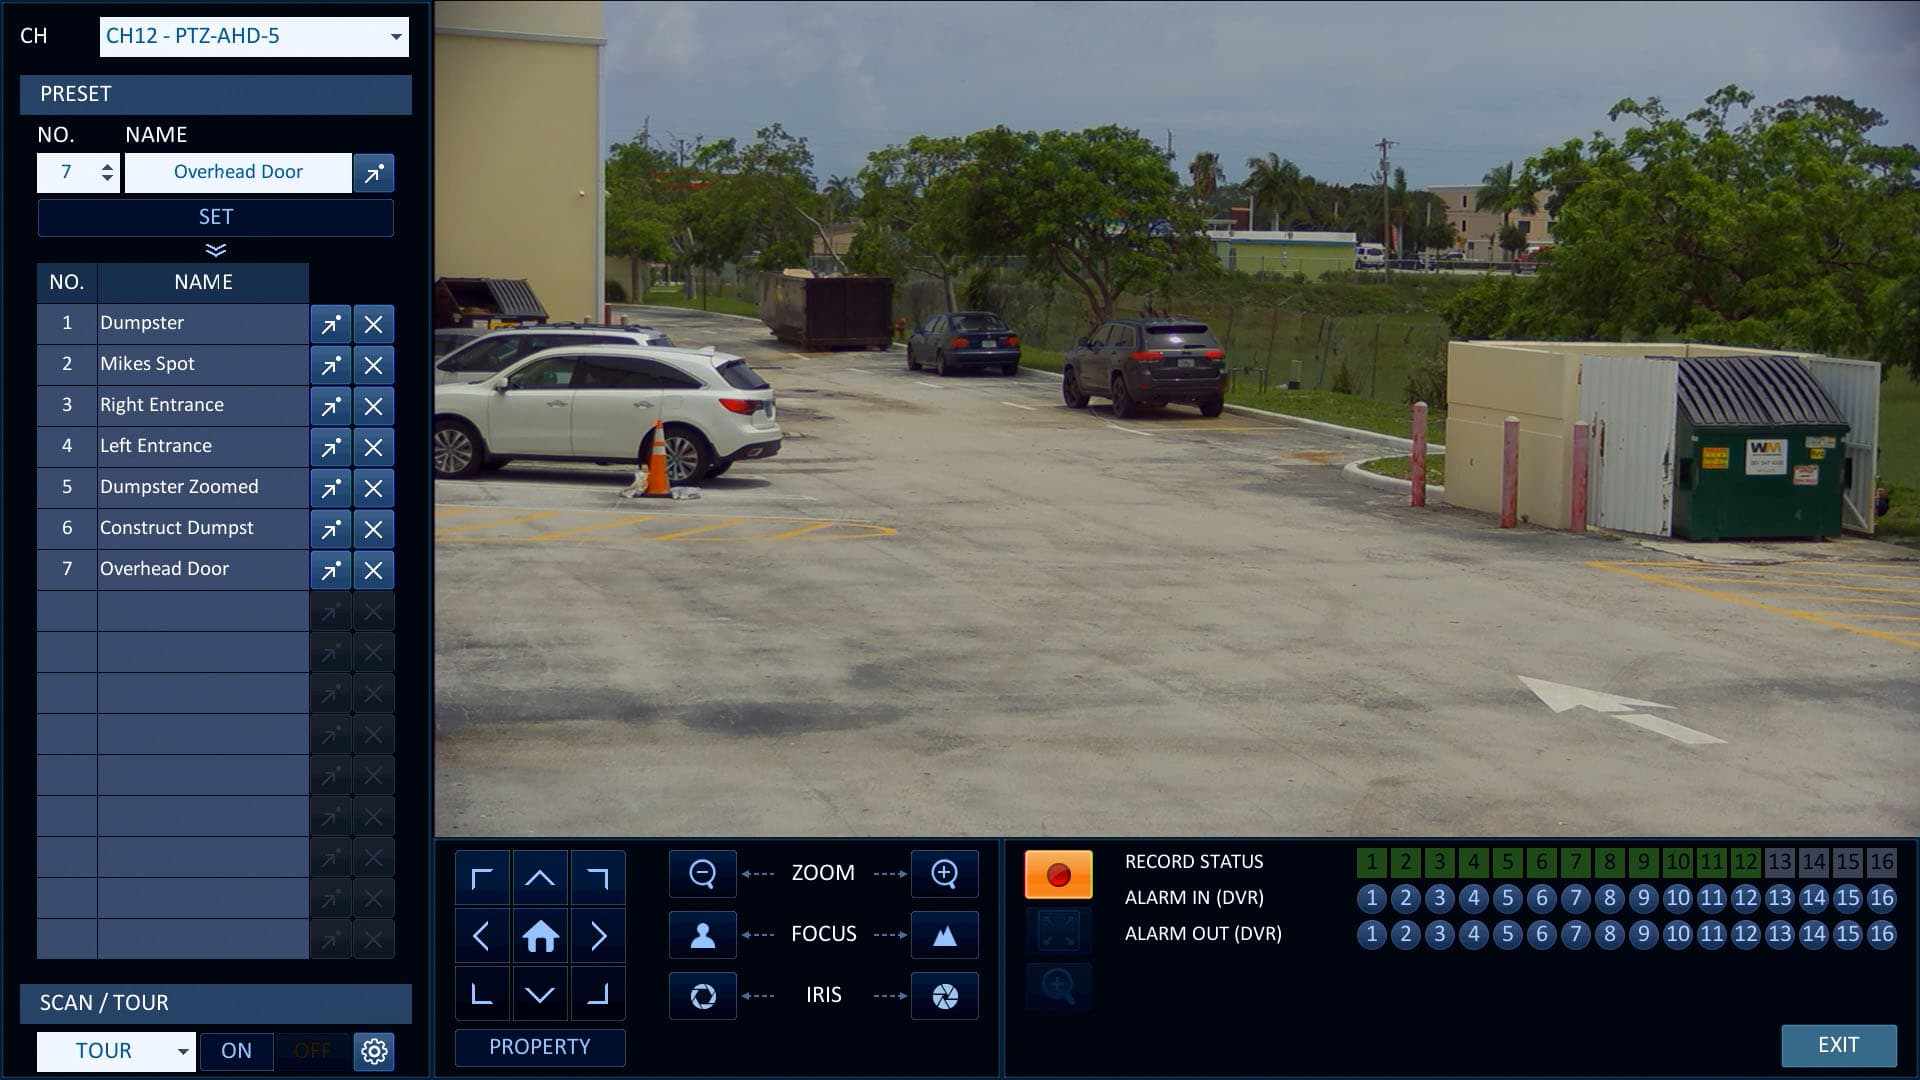 Ptz Camera Controller Setup Wiring Diagram Hd Controls From Idvr Pro Surveillance Dvr